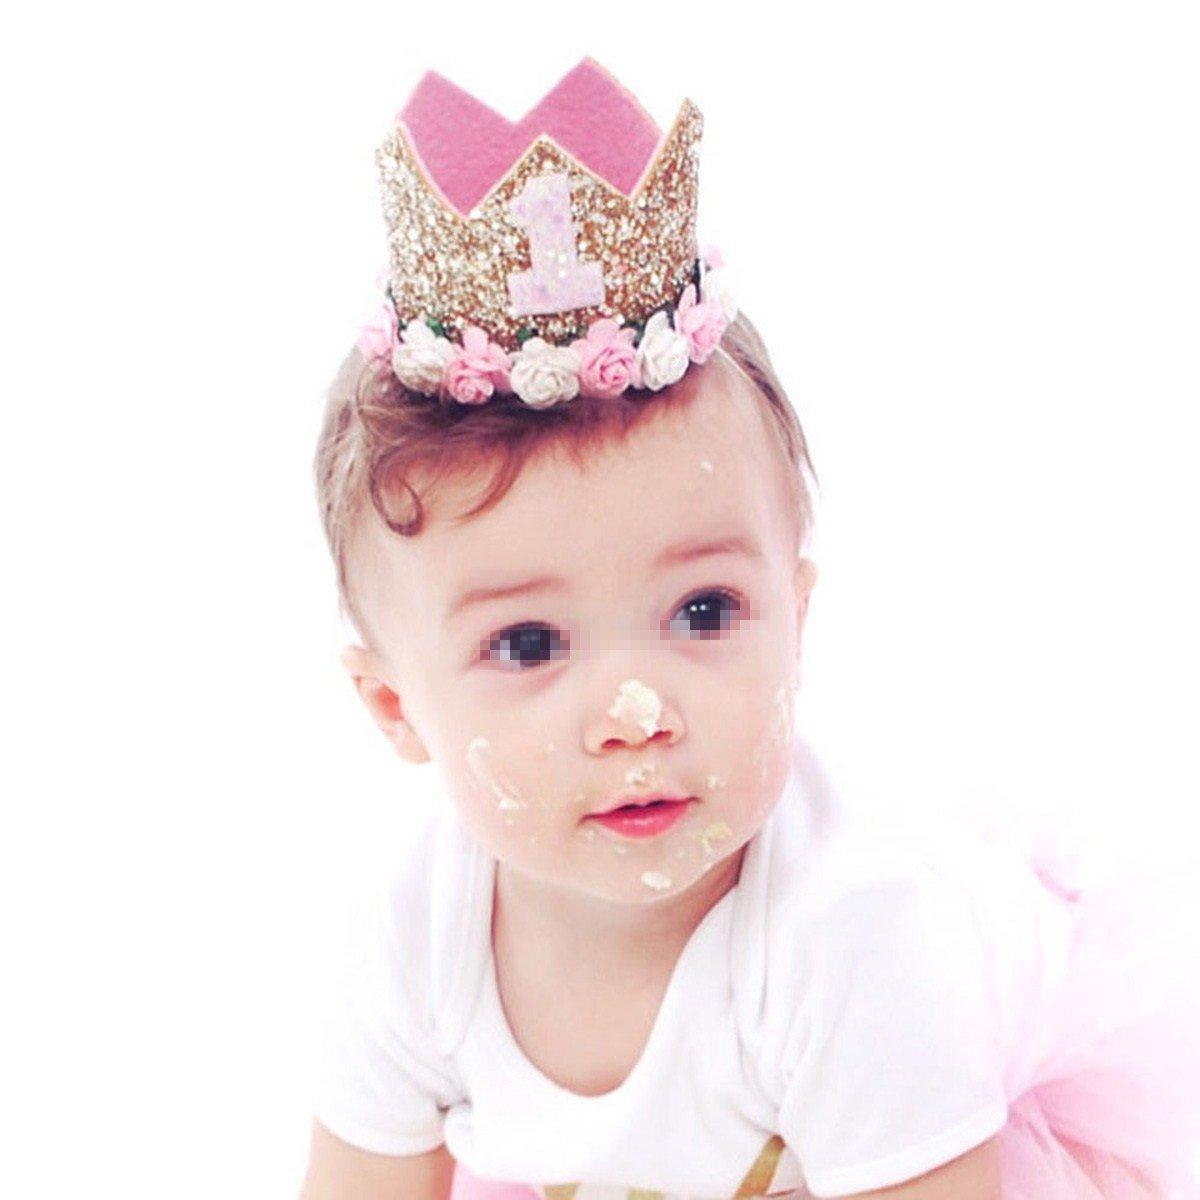 Amazon.com: TOYMYTOY Baby Princess Tiara Crown,Baby Girls Birthday Hat Flower Crown Headband(Type 2): Toys & Games